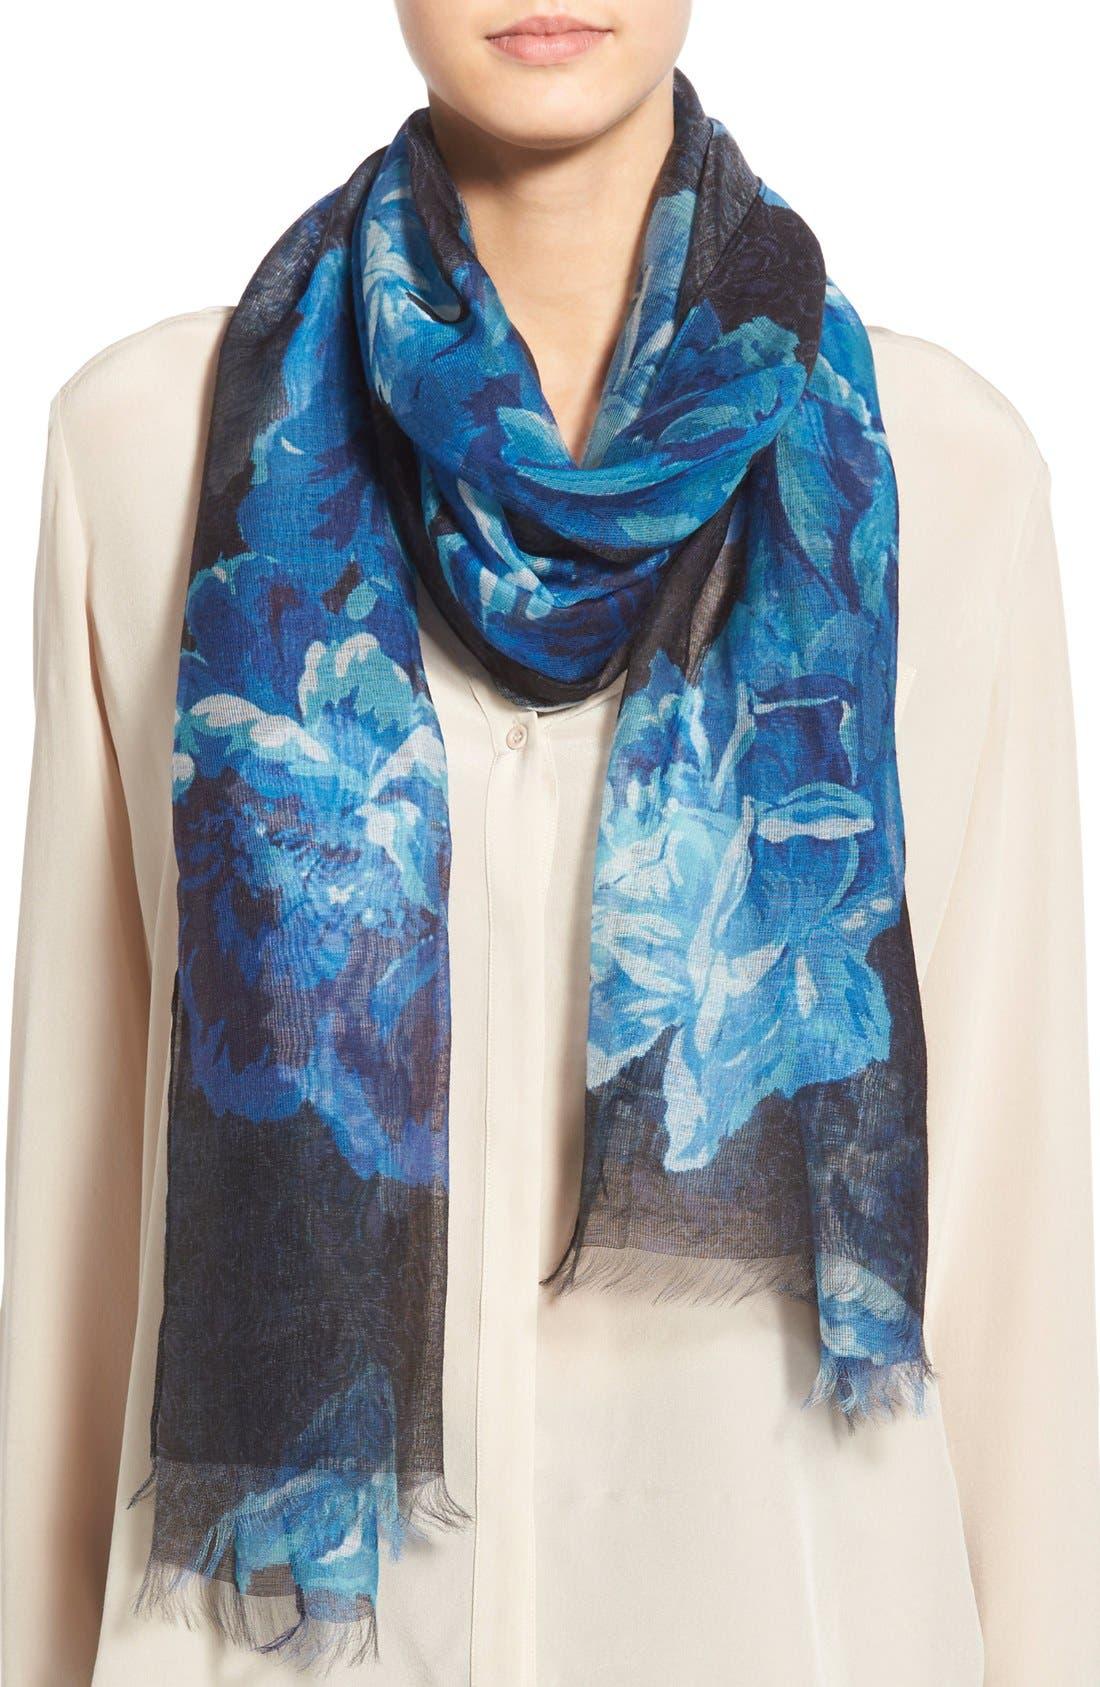 Badgley Mischka 'Sheer Rose' Floral Print Modal & Silk Scarf